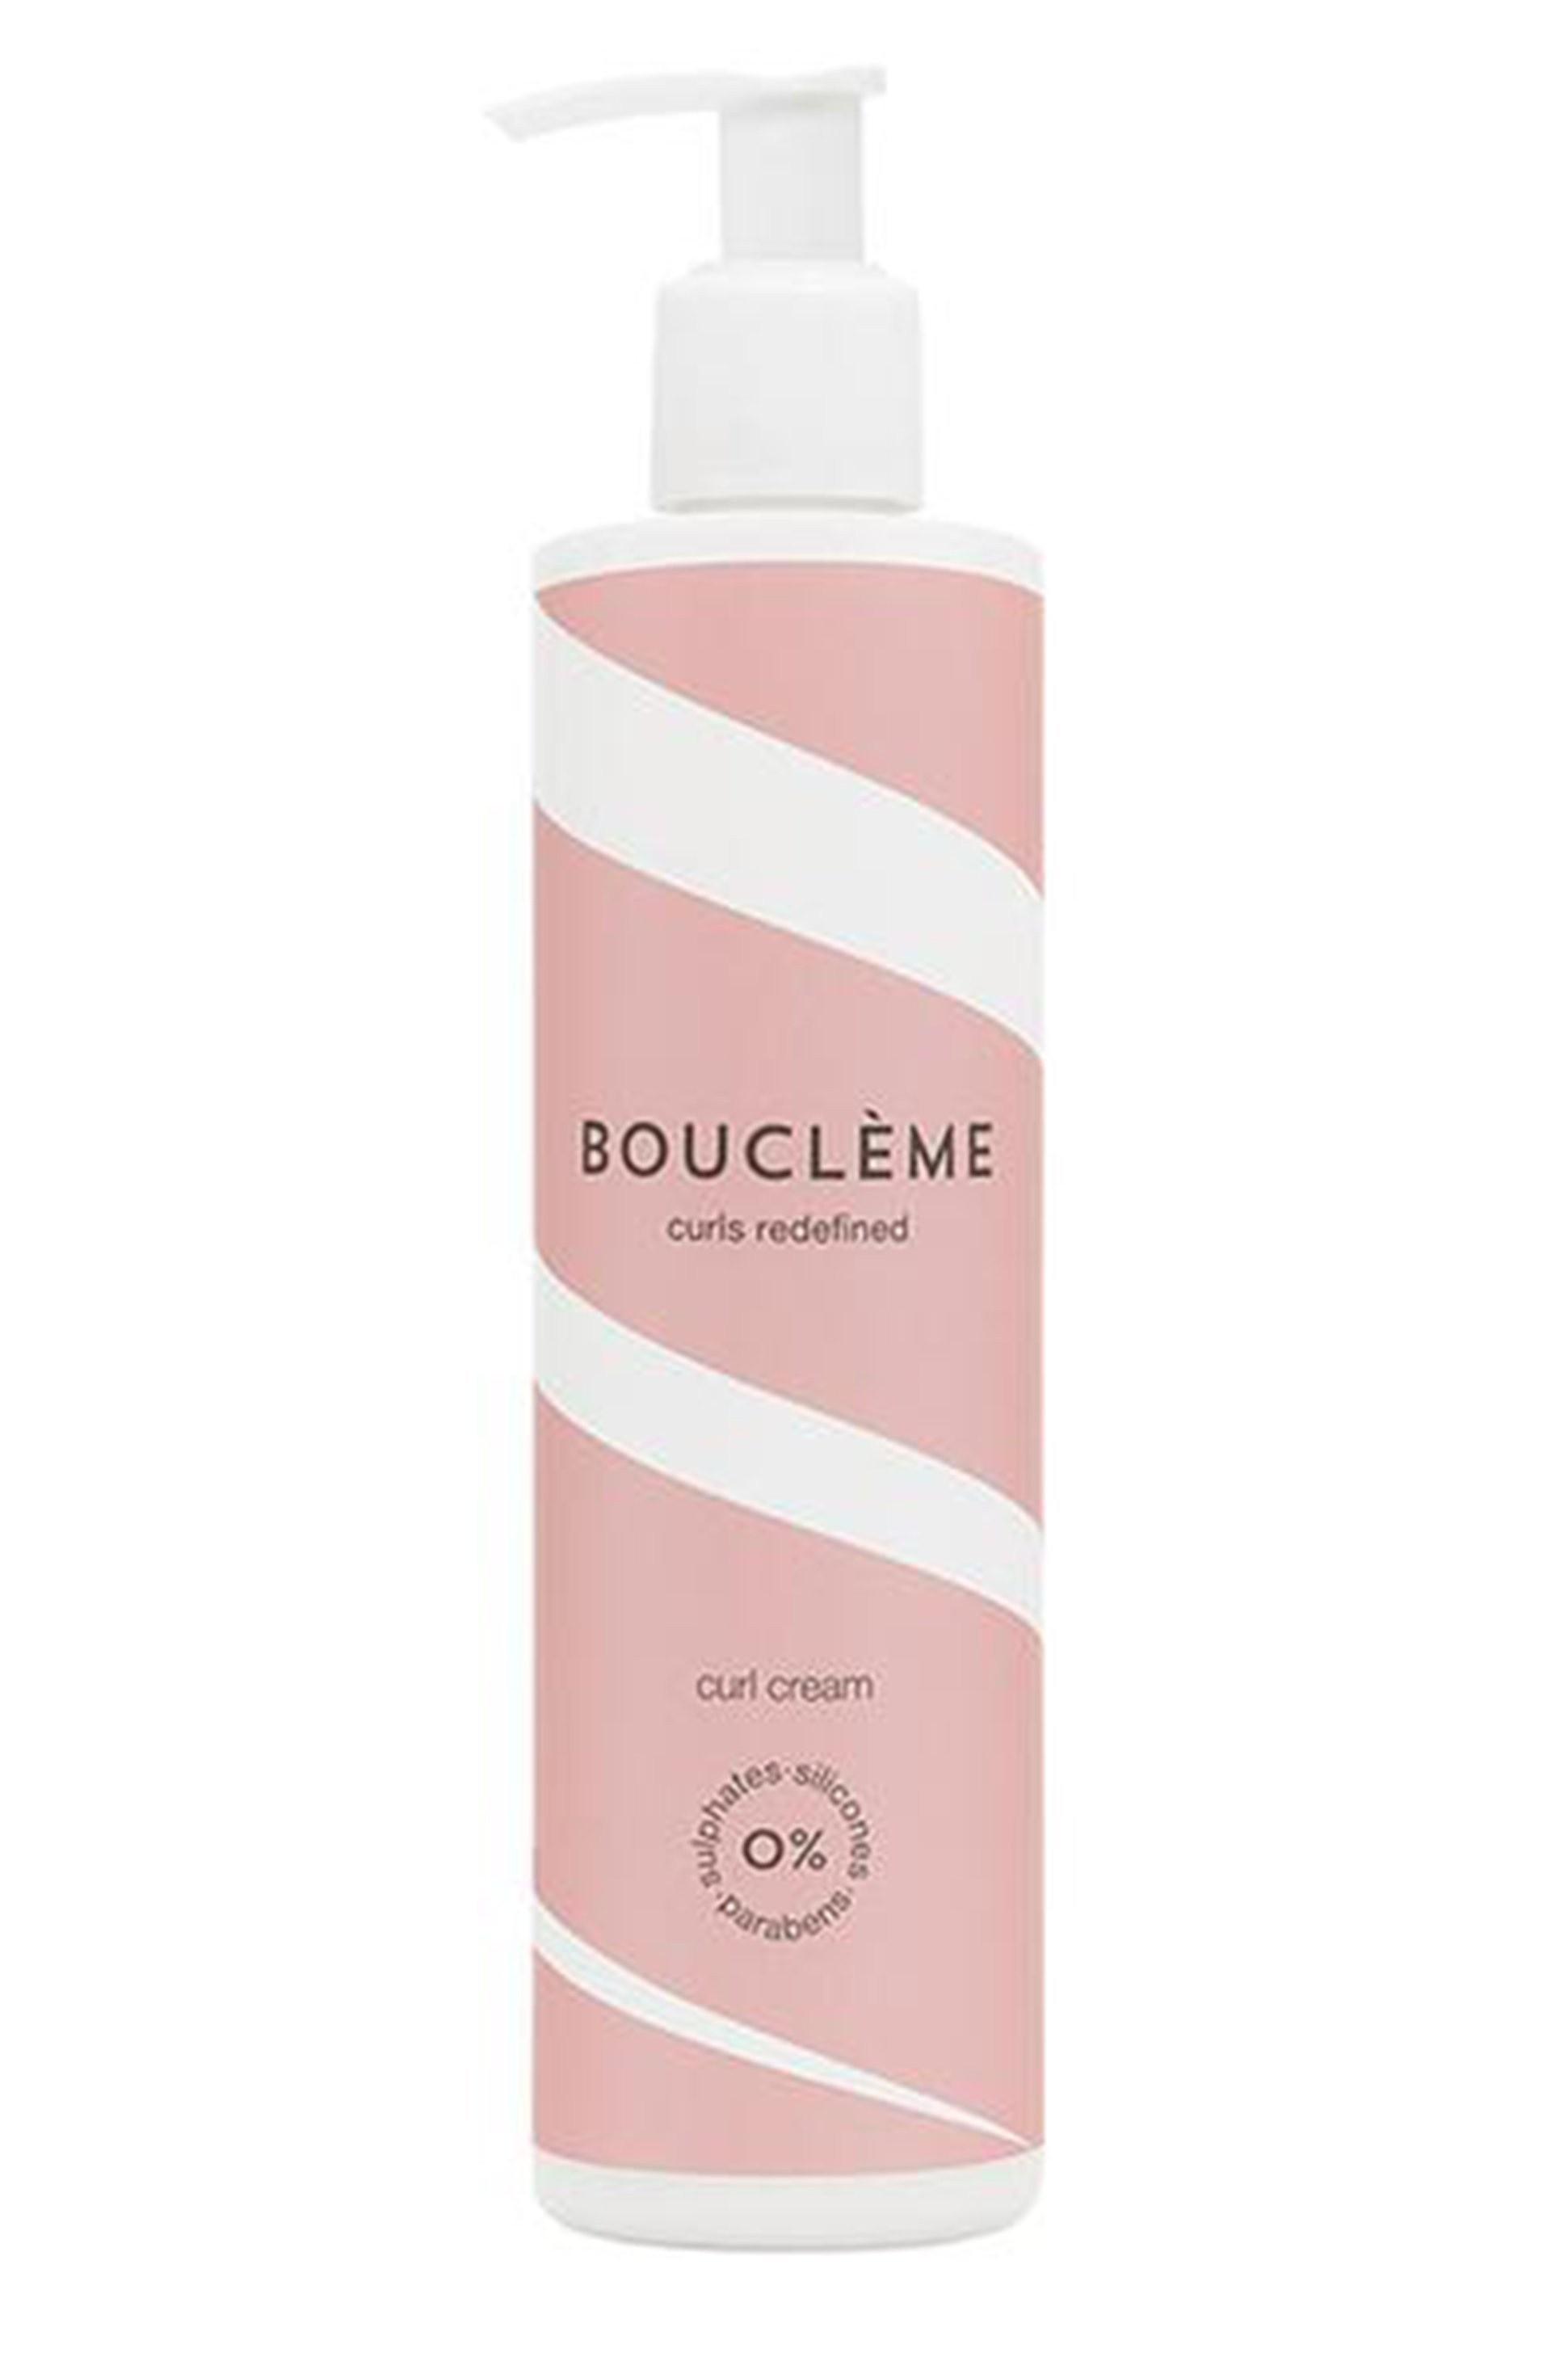 BOUCLEME Curls Redefined Curl Cream